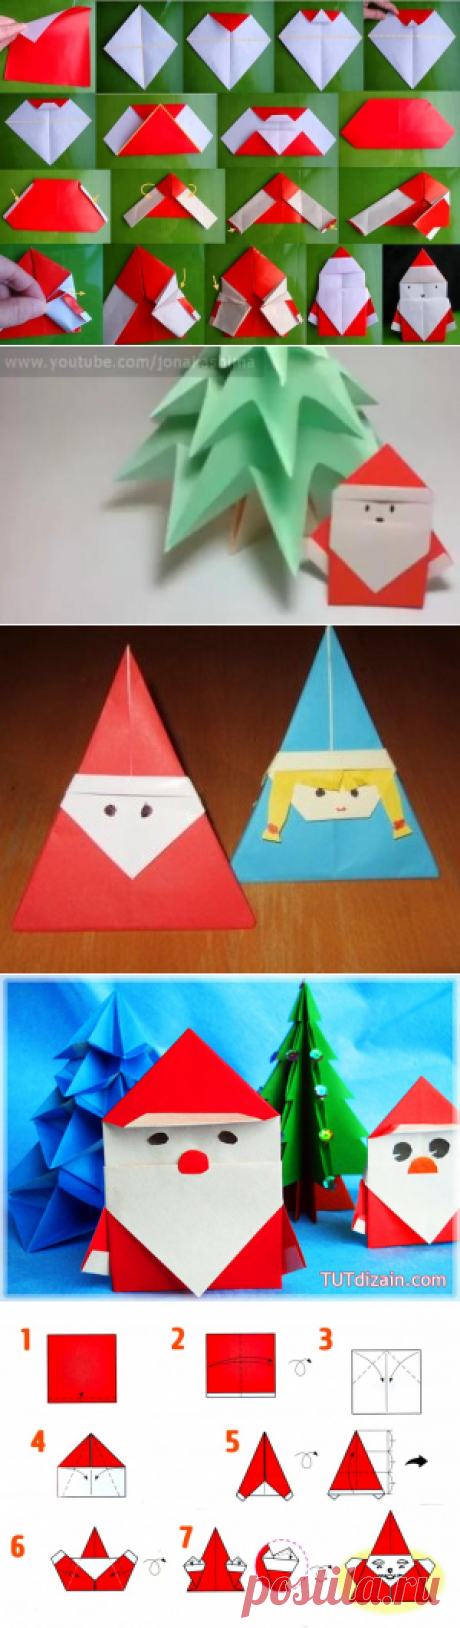 imgplusdb.com / оригами из бумаги дед мороз